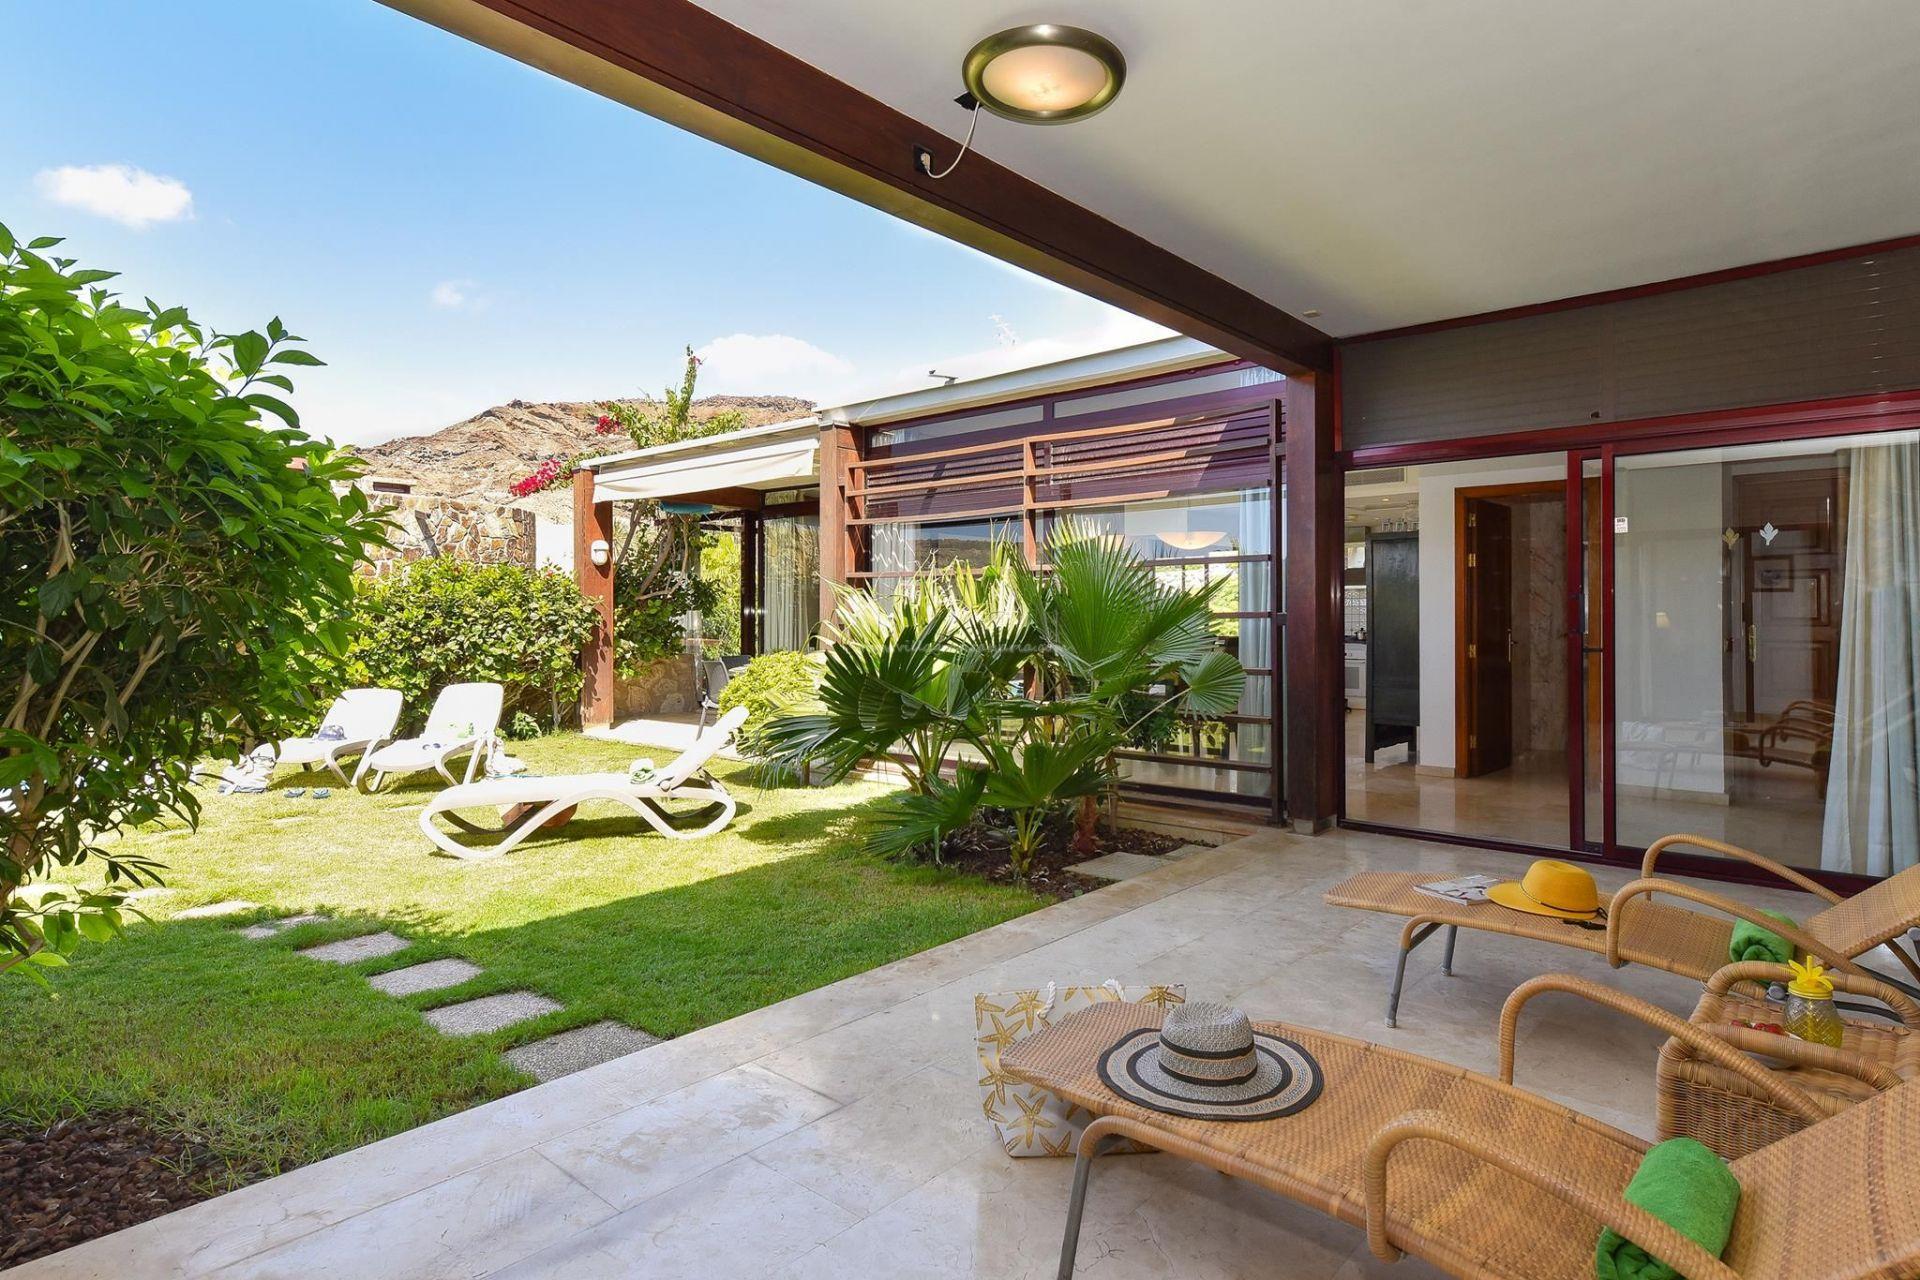 Holiday Rental Villa Tauro Beach Golf 2 Villagrancanaria